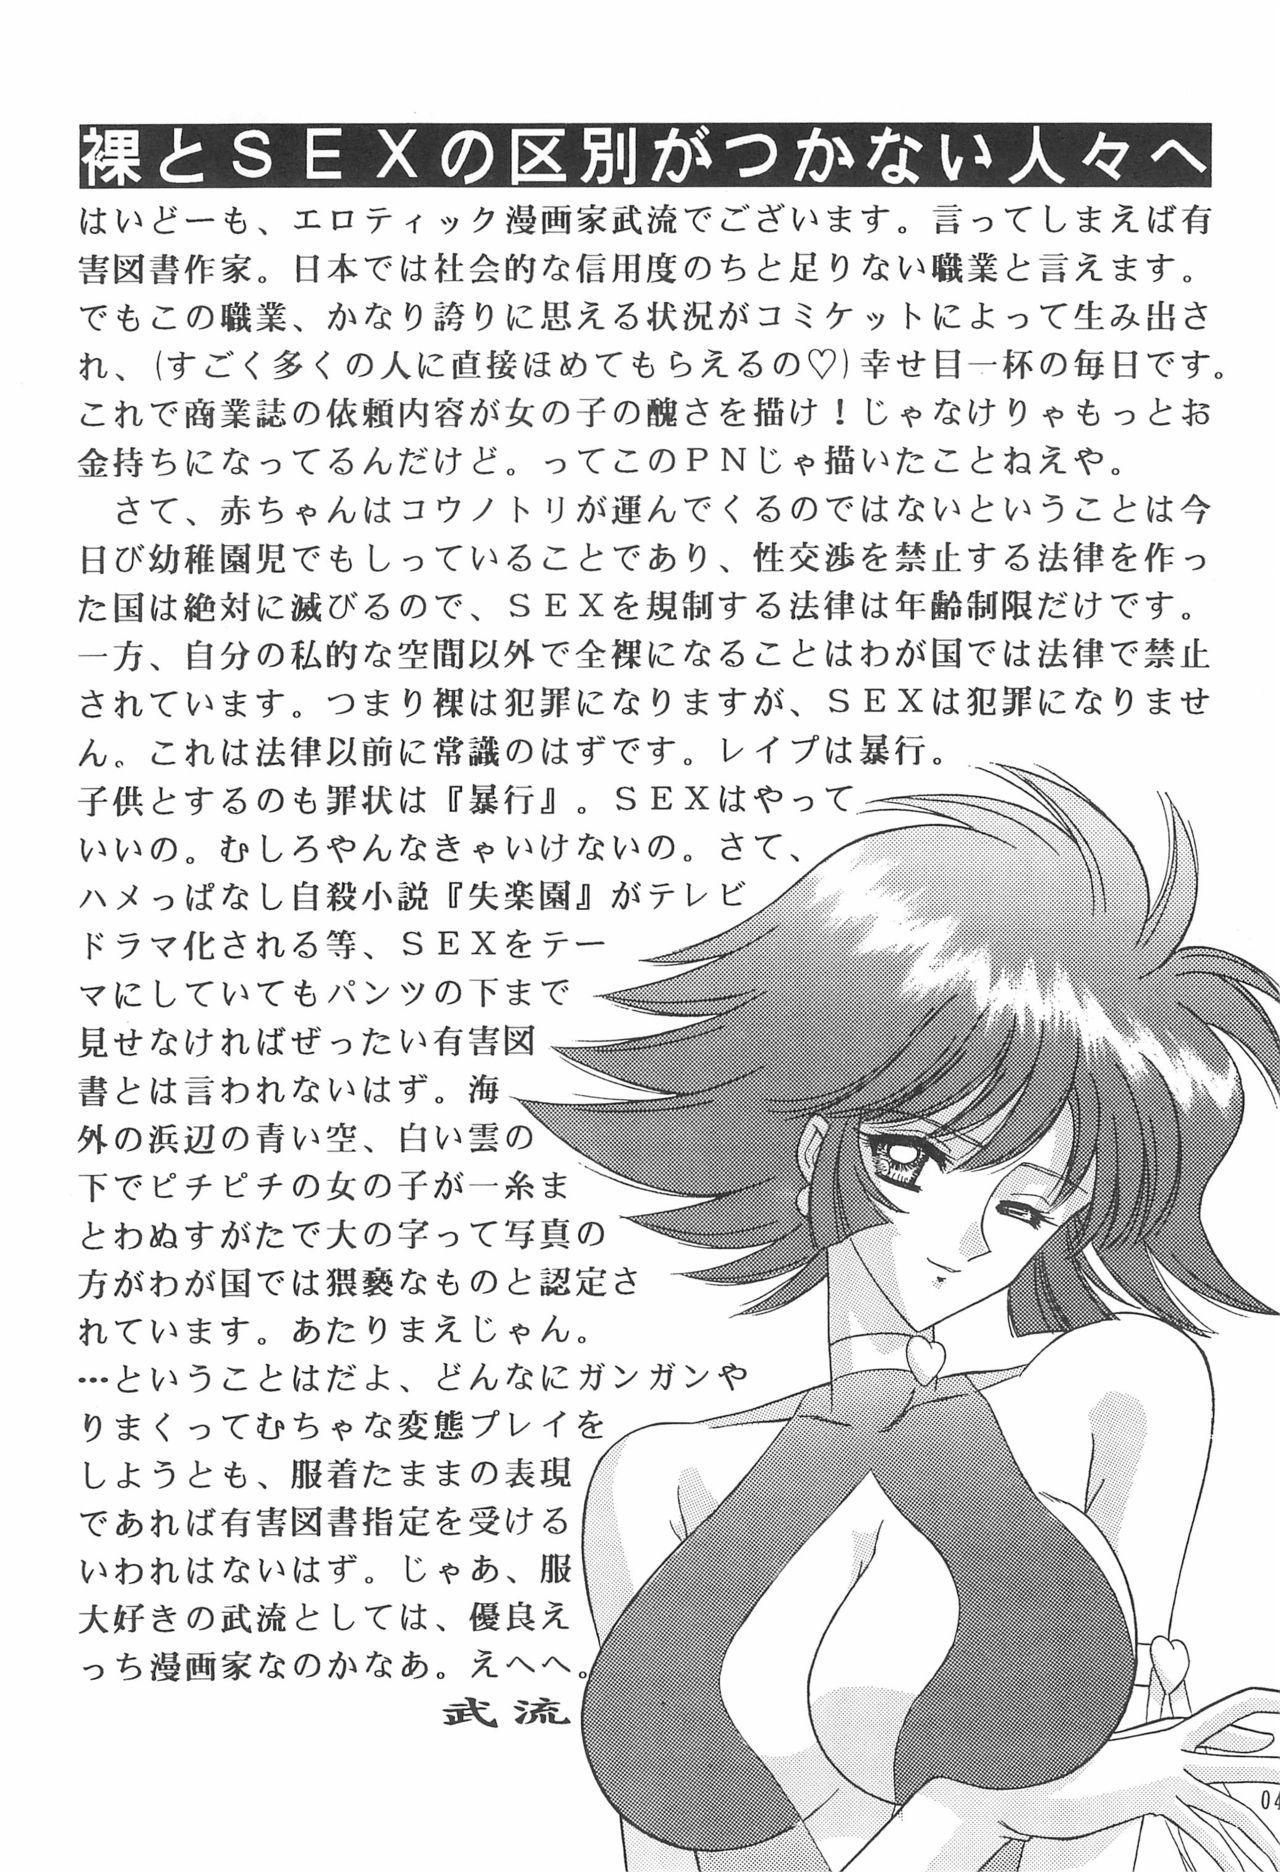 Showbaku 5